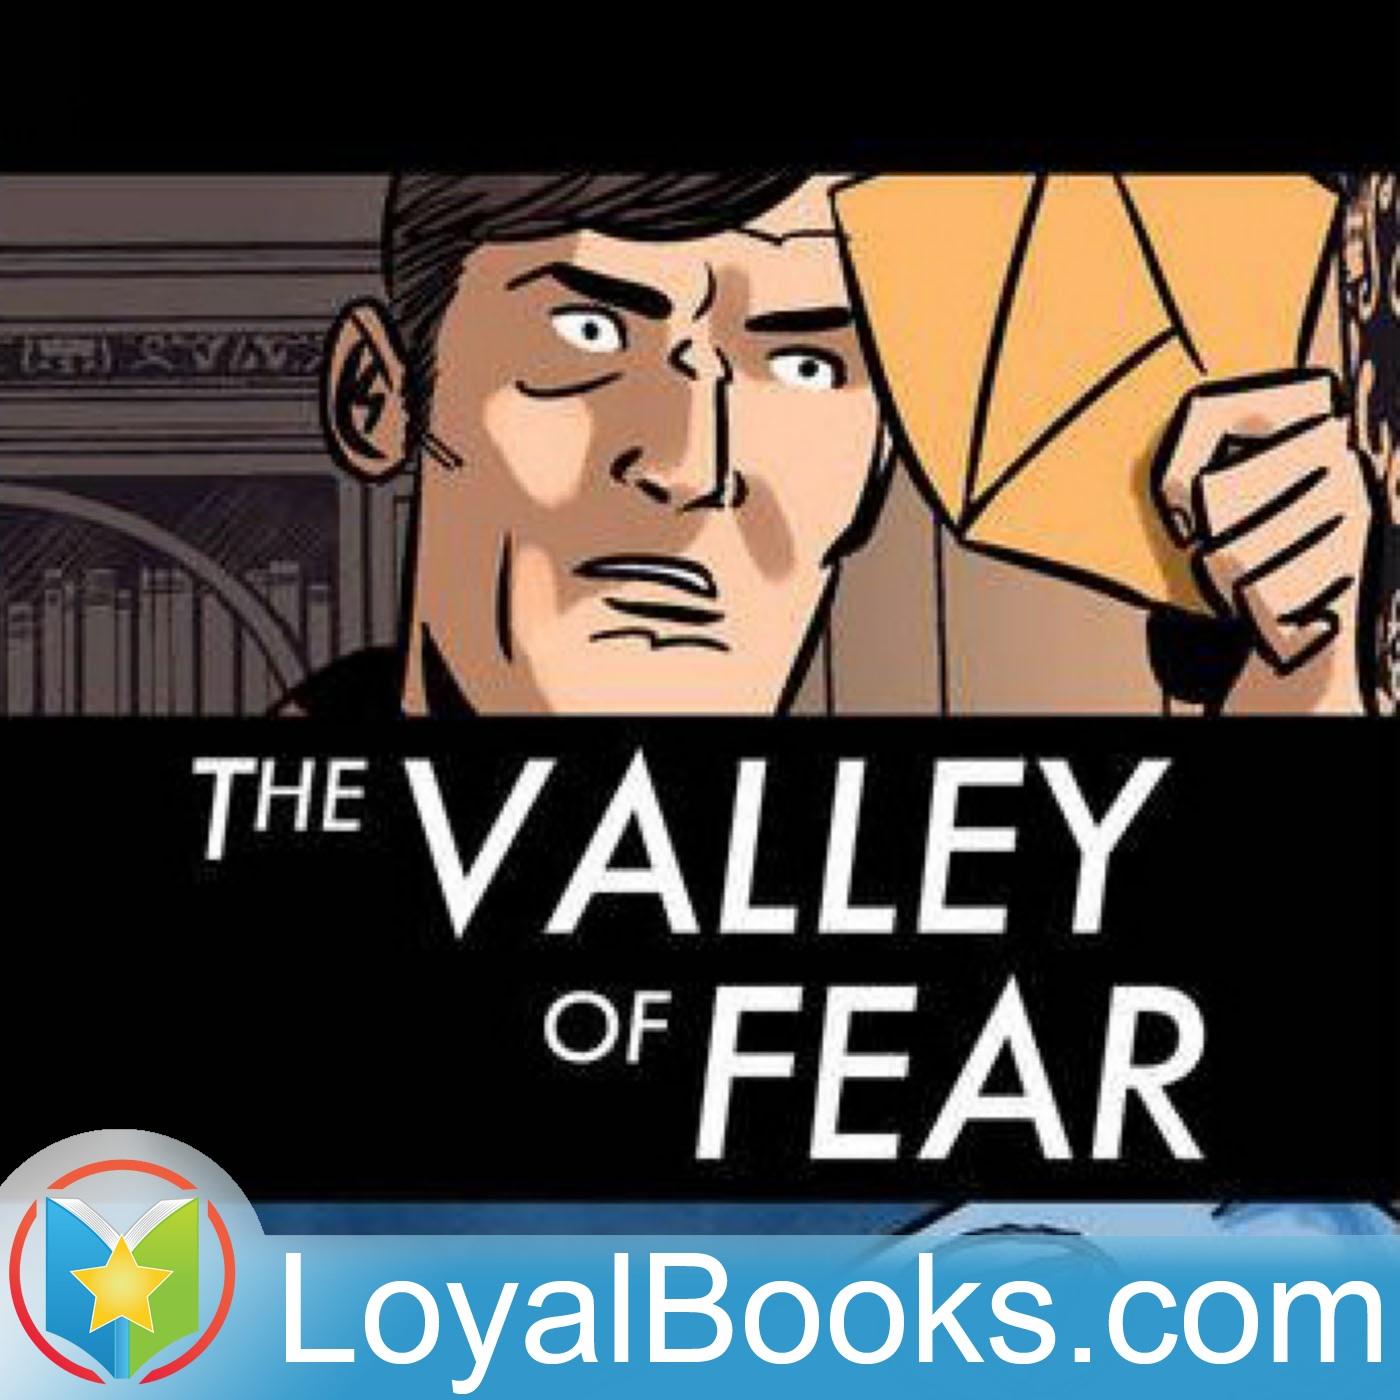 <![CDATA[The Valley of Fear by Sir Arthur Conan Doyle]]>